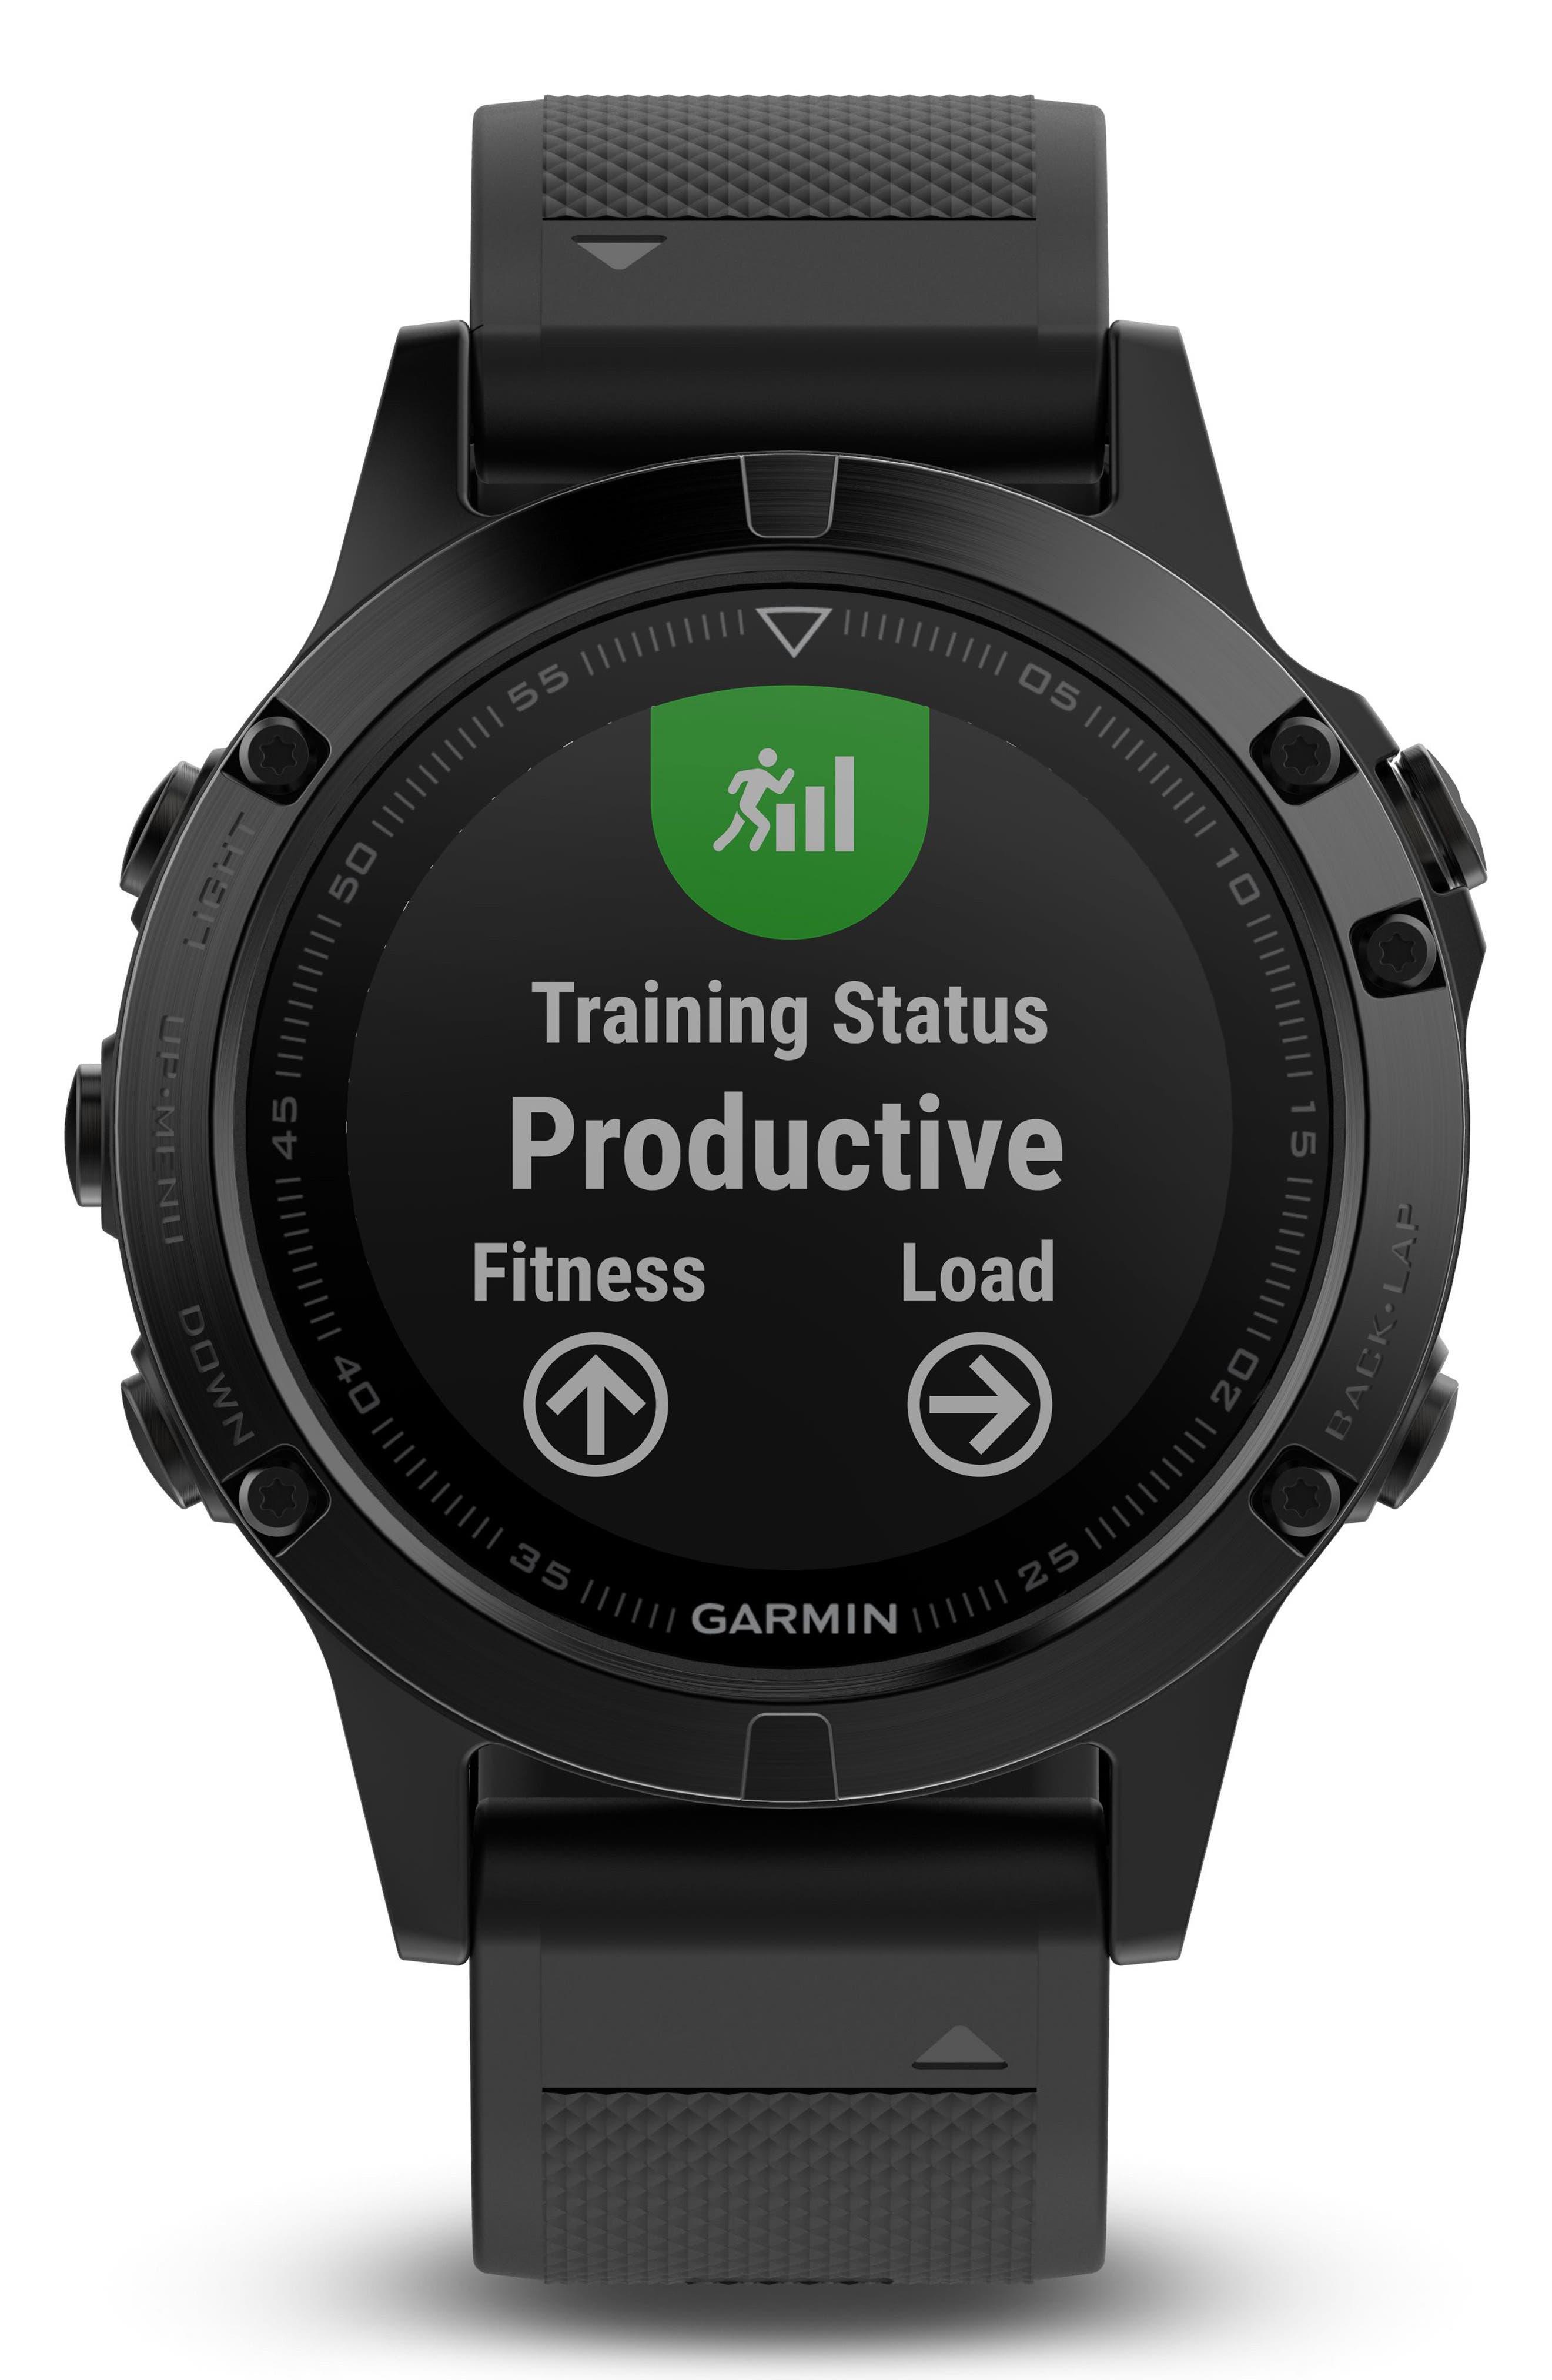 GARMIN fenix<sup>®</sup> 5 Sapphire Premium Multisport GPS Watch, 47mm, Main, color, BLACK/ BLACK SAPPHIRE